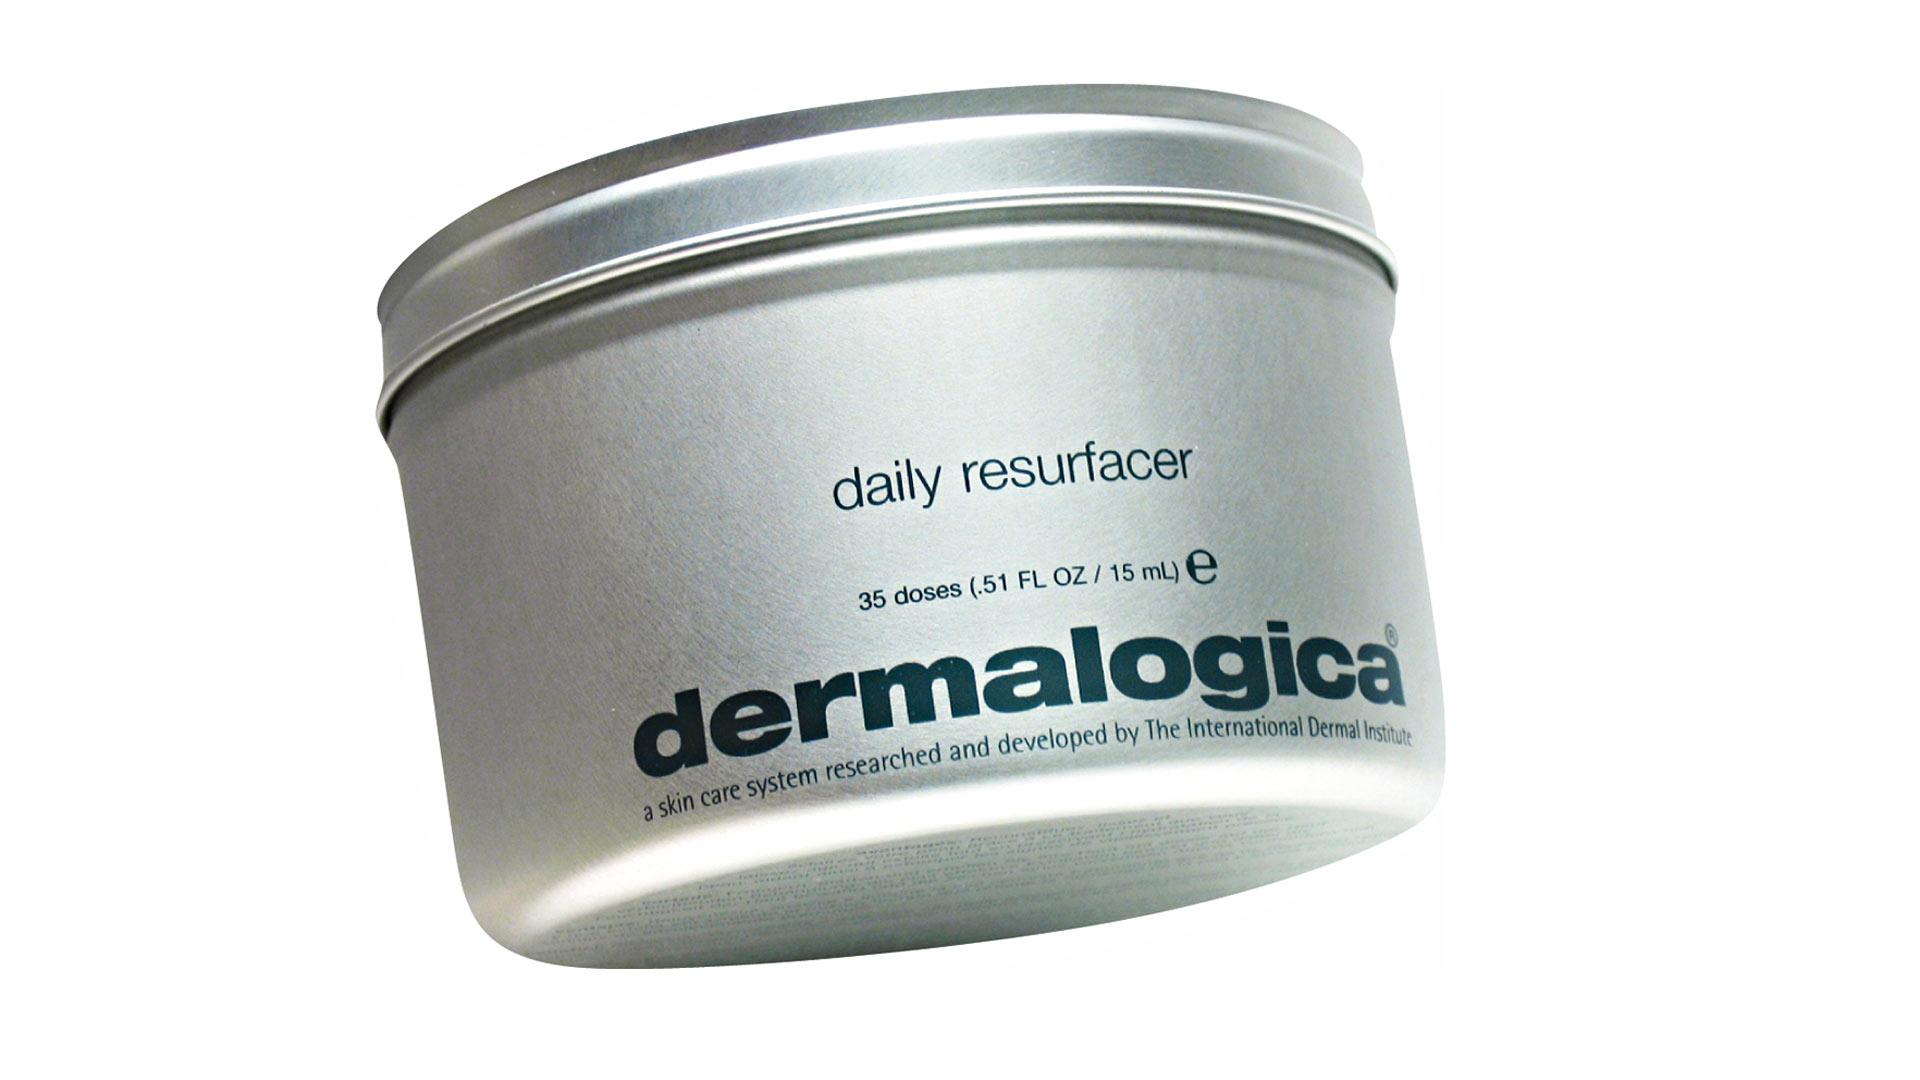 Dermalogica Daily Resurfacer kuorinta, 75,40 €/35 kpl.